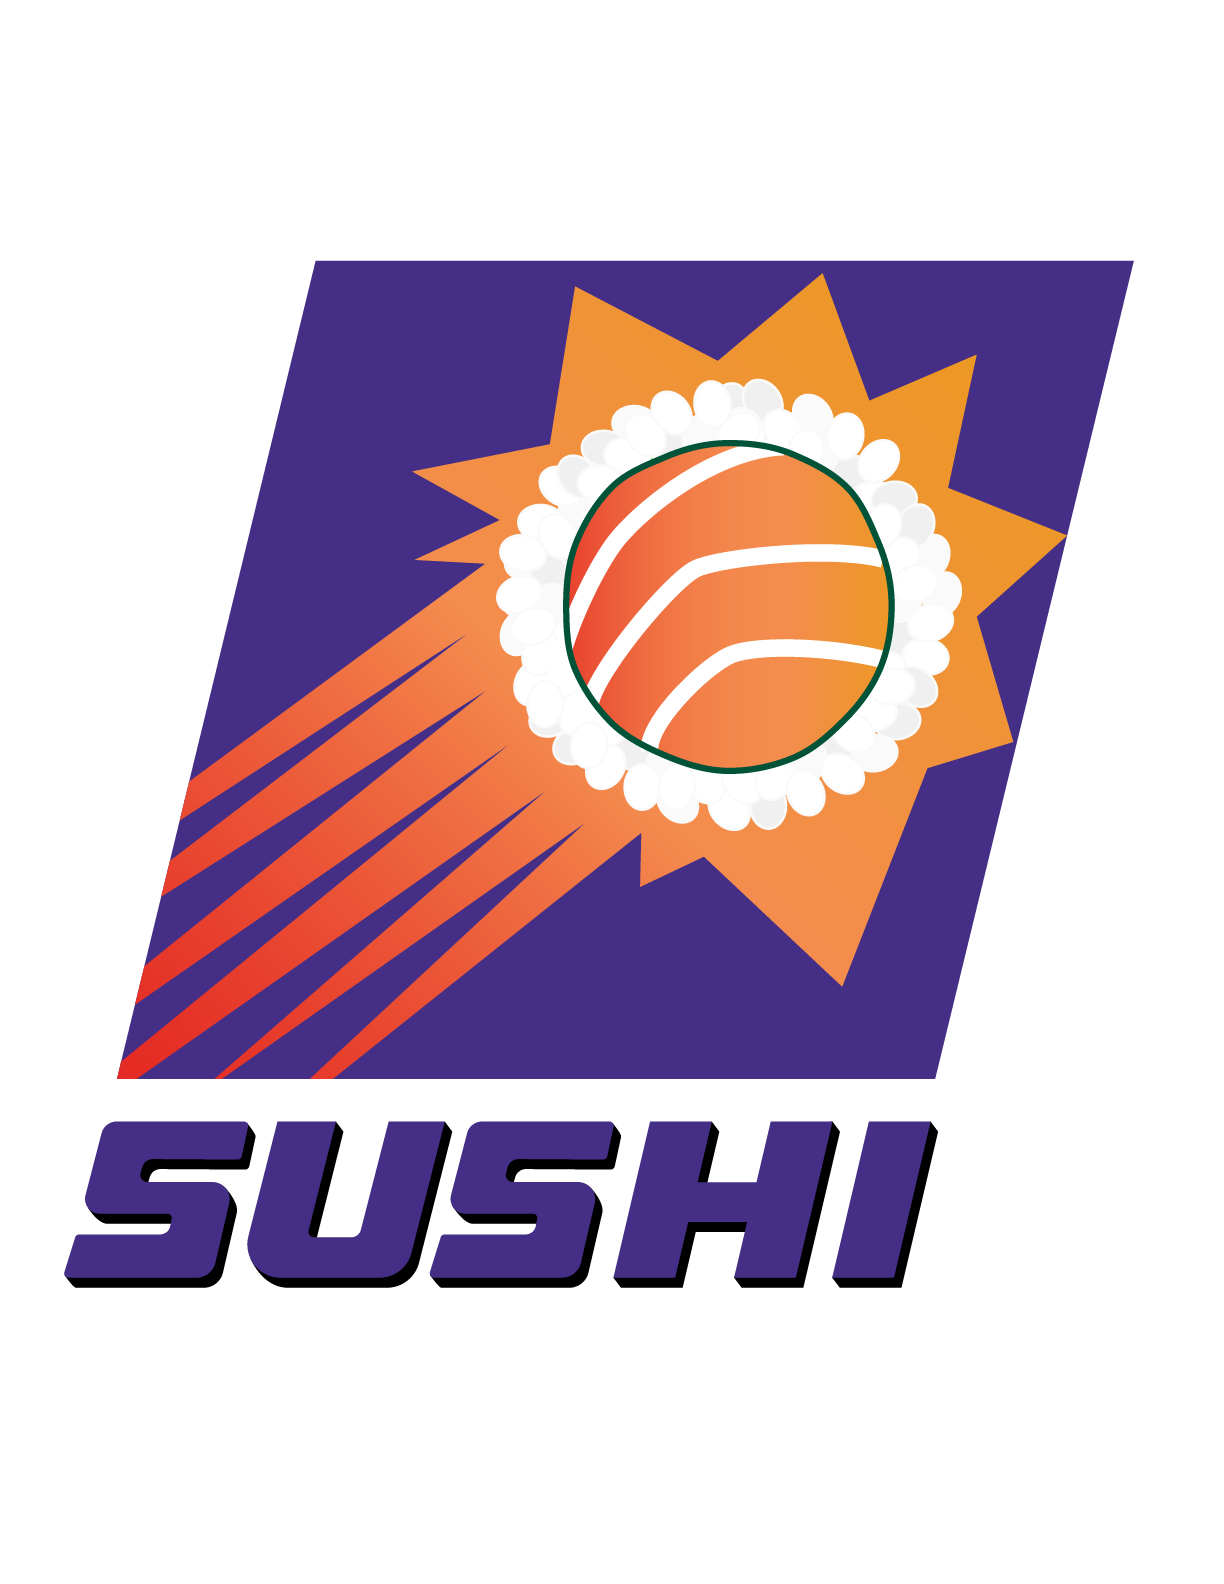 PHX Sushi@2x.png